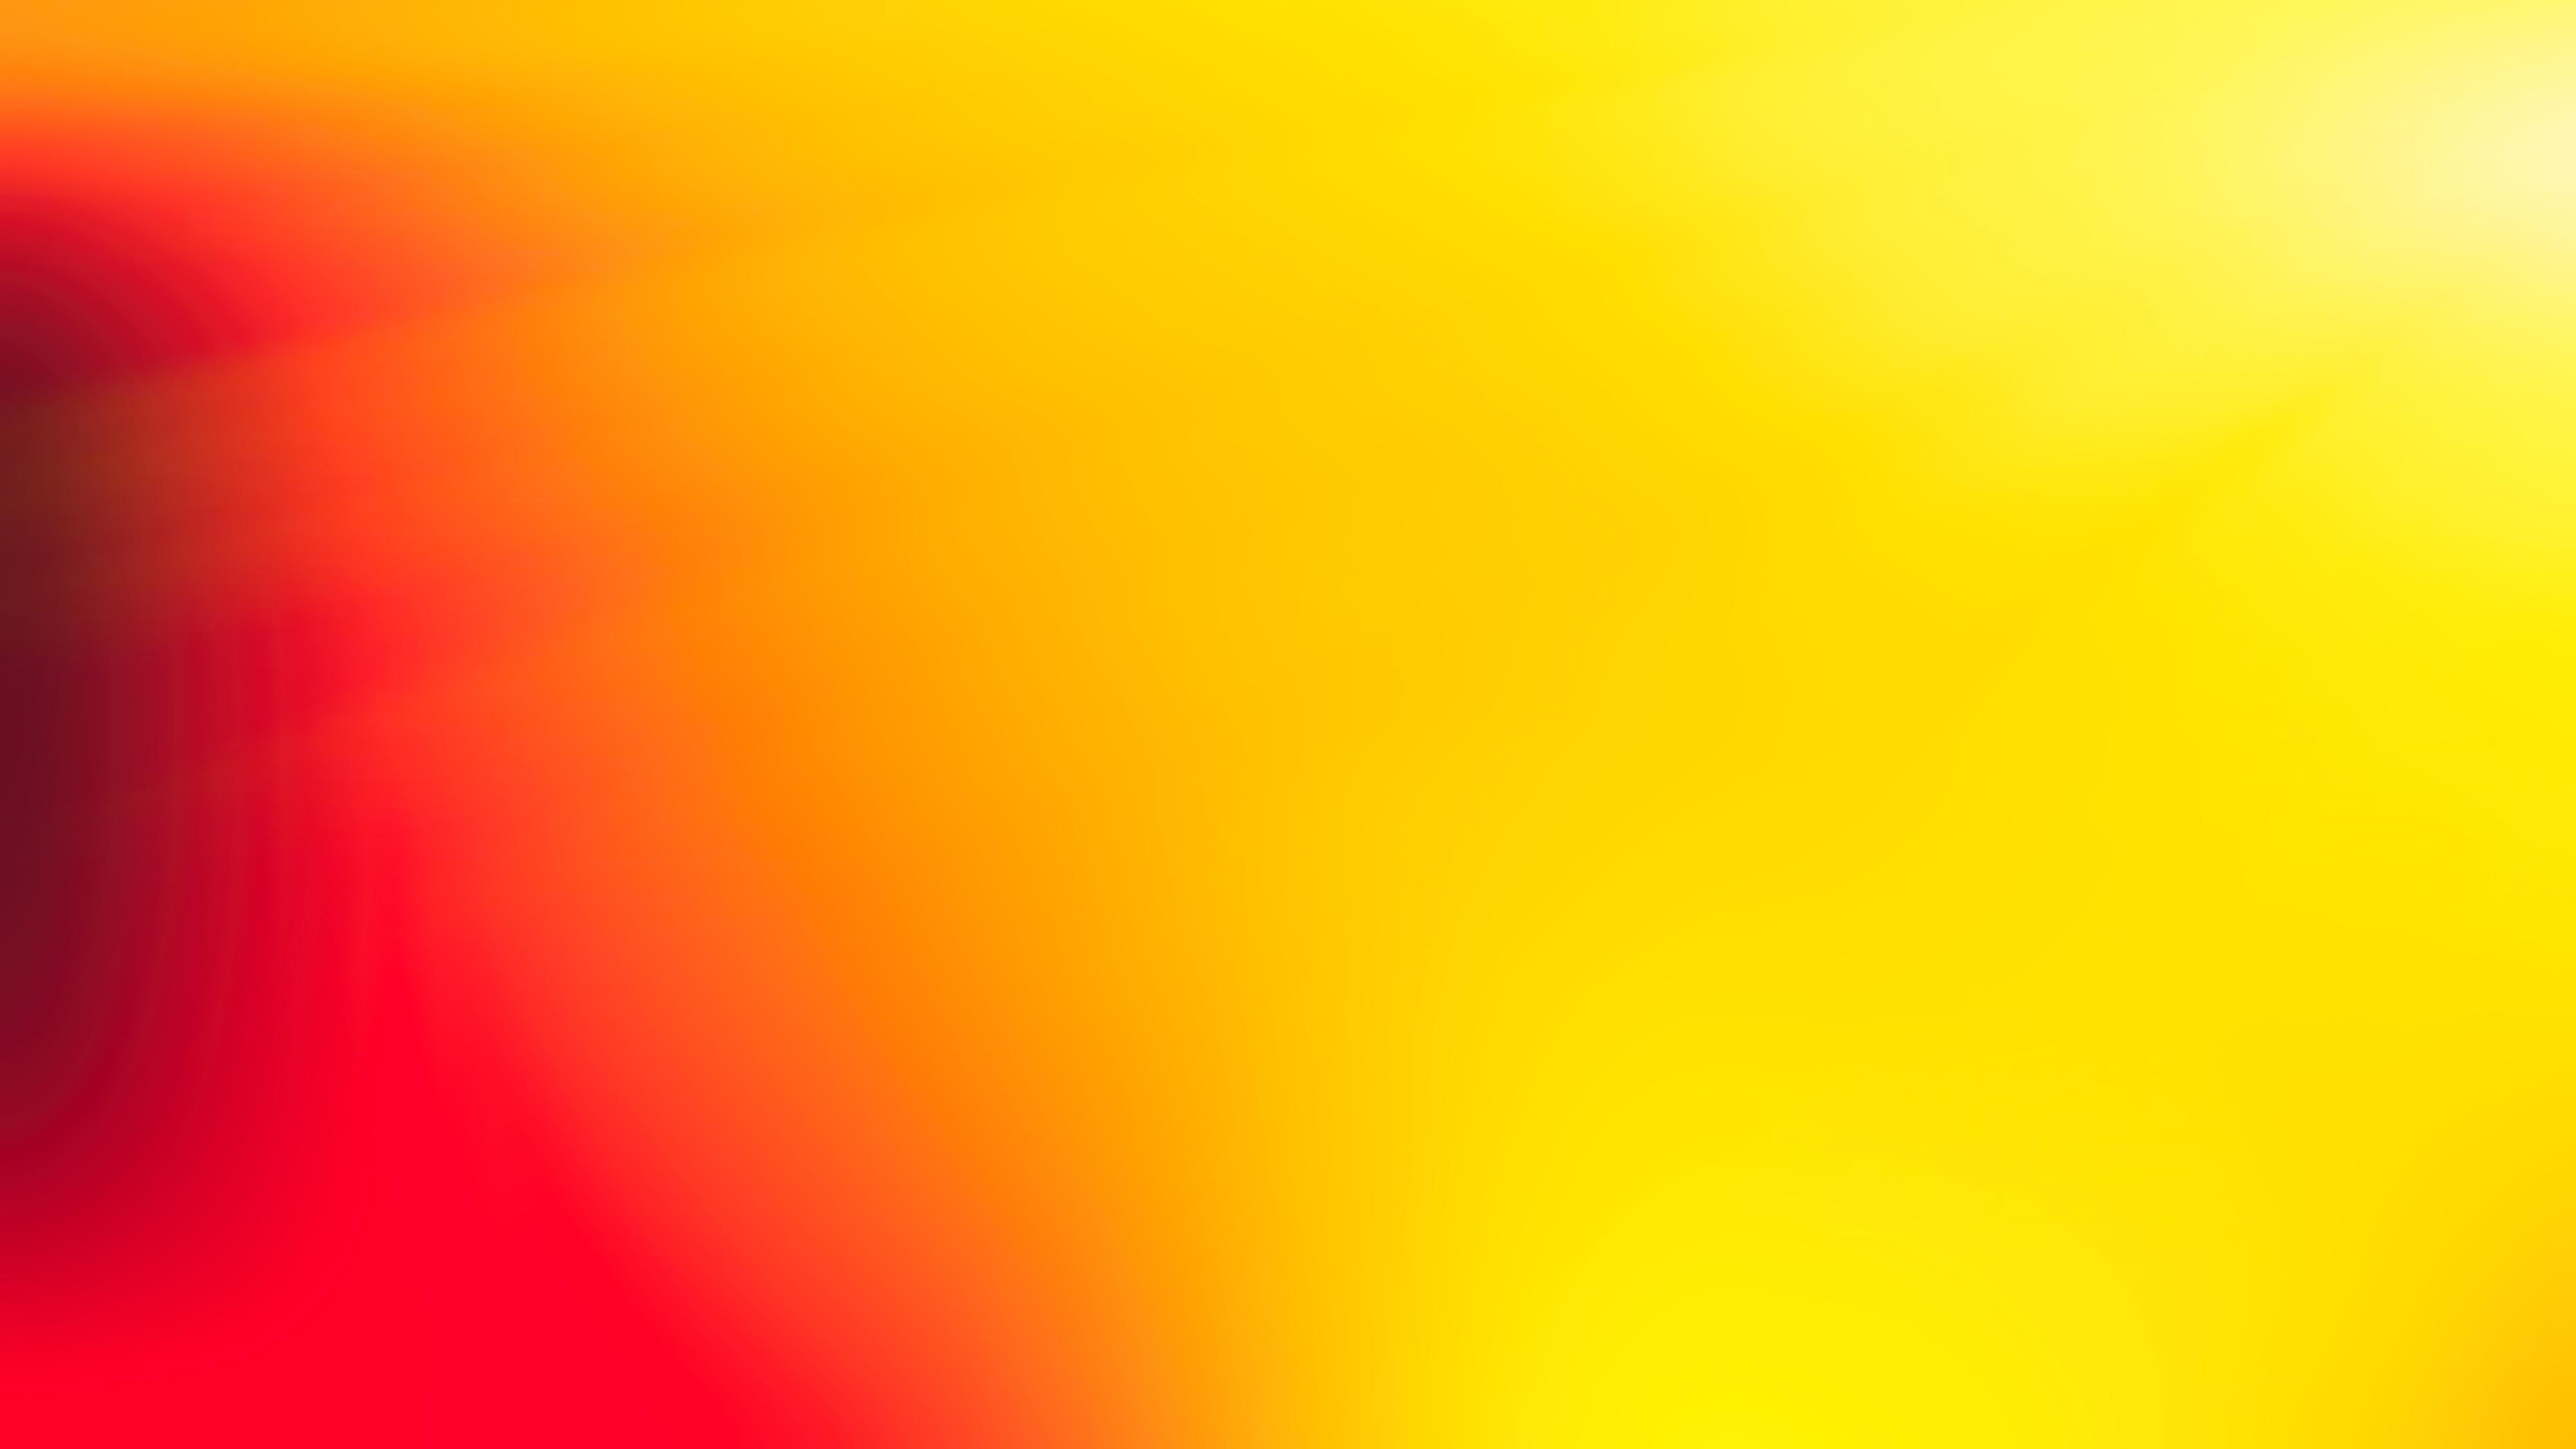 Orange Yellow Red – Free Background Image